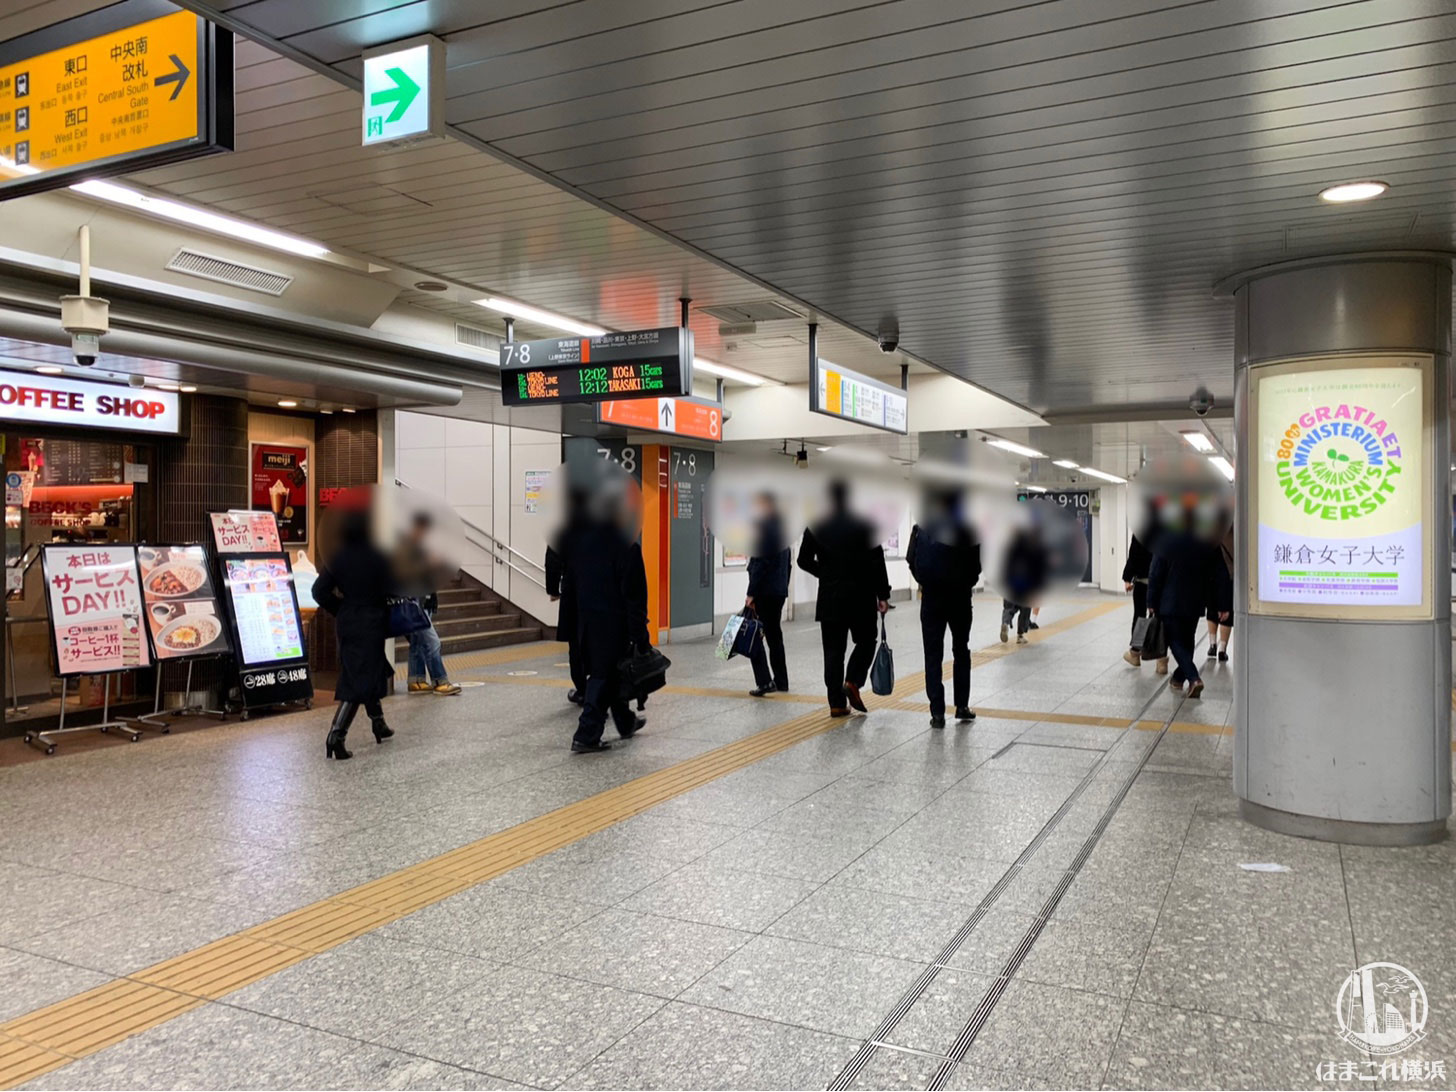 横浜駅 現在のJR中央南改札内